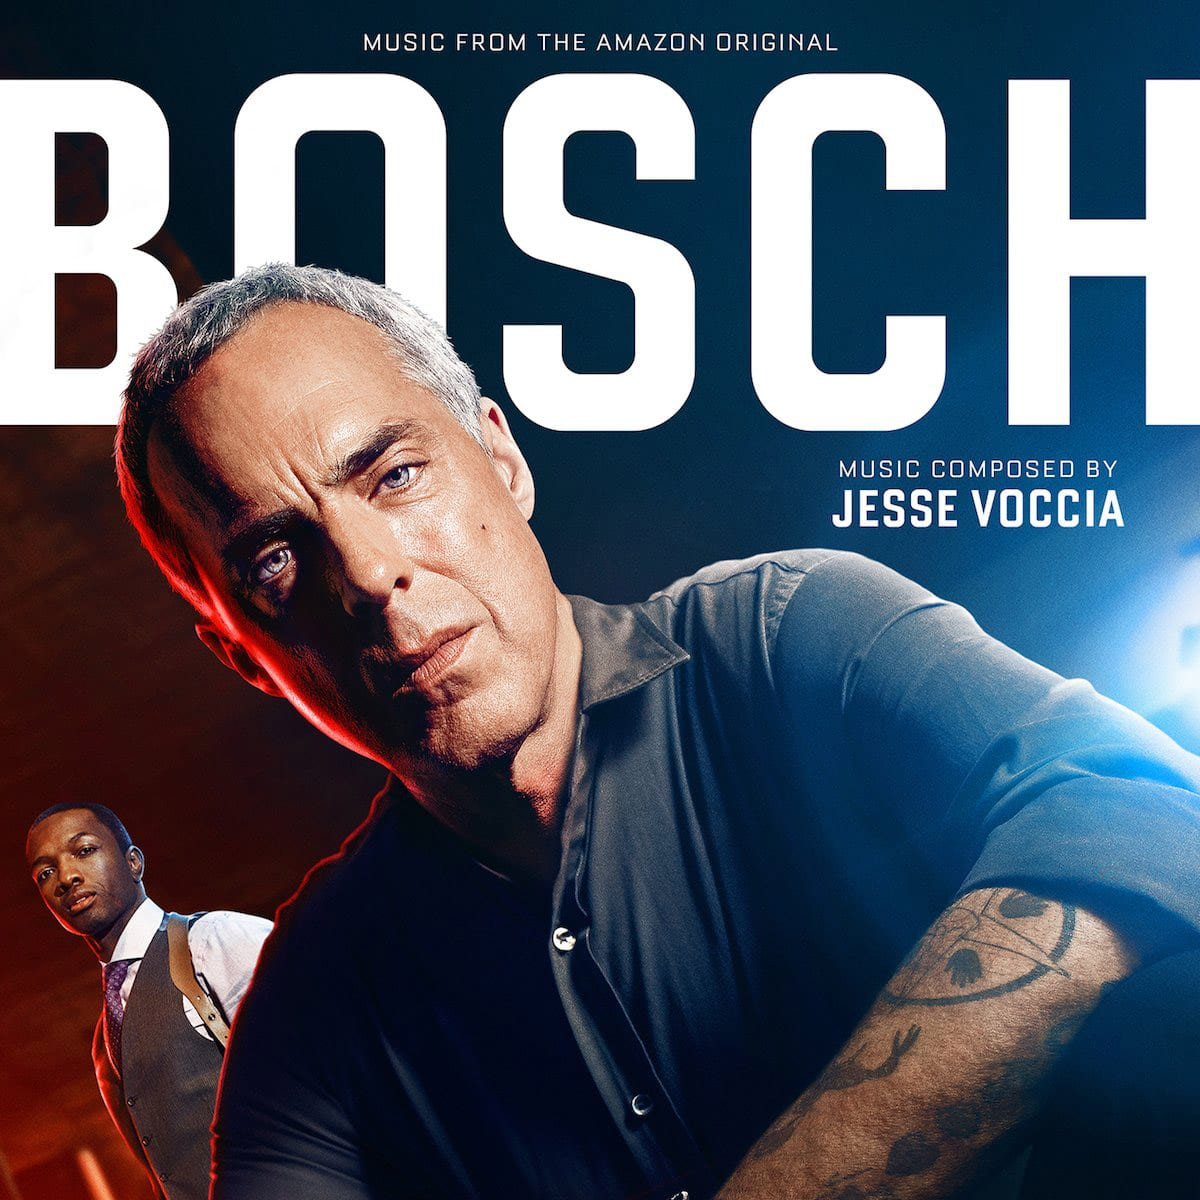 Bosch (S1,2,3) soundtrack by Jesse Voccia released